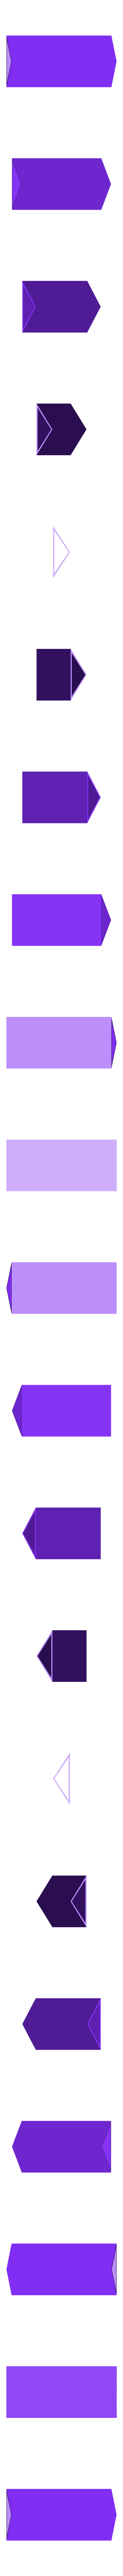 D6494c59 bf9c 4b87 ab22 2bc0b94bb27d